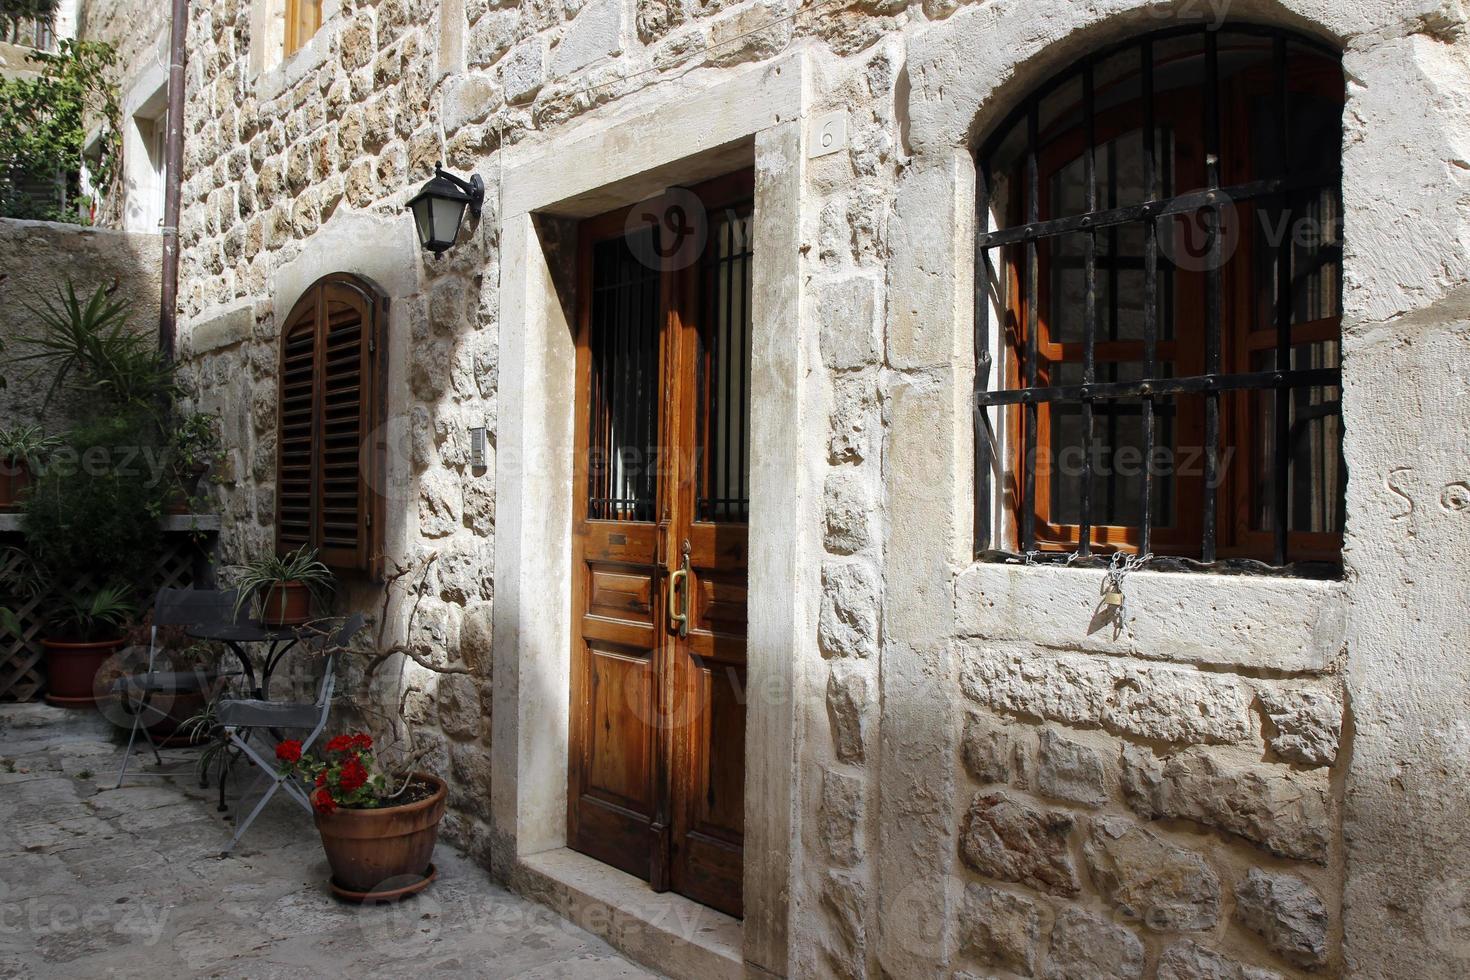 straat in het kleine stadje Dubrovnik, Kroatië foto